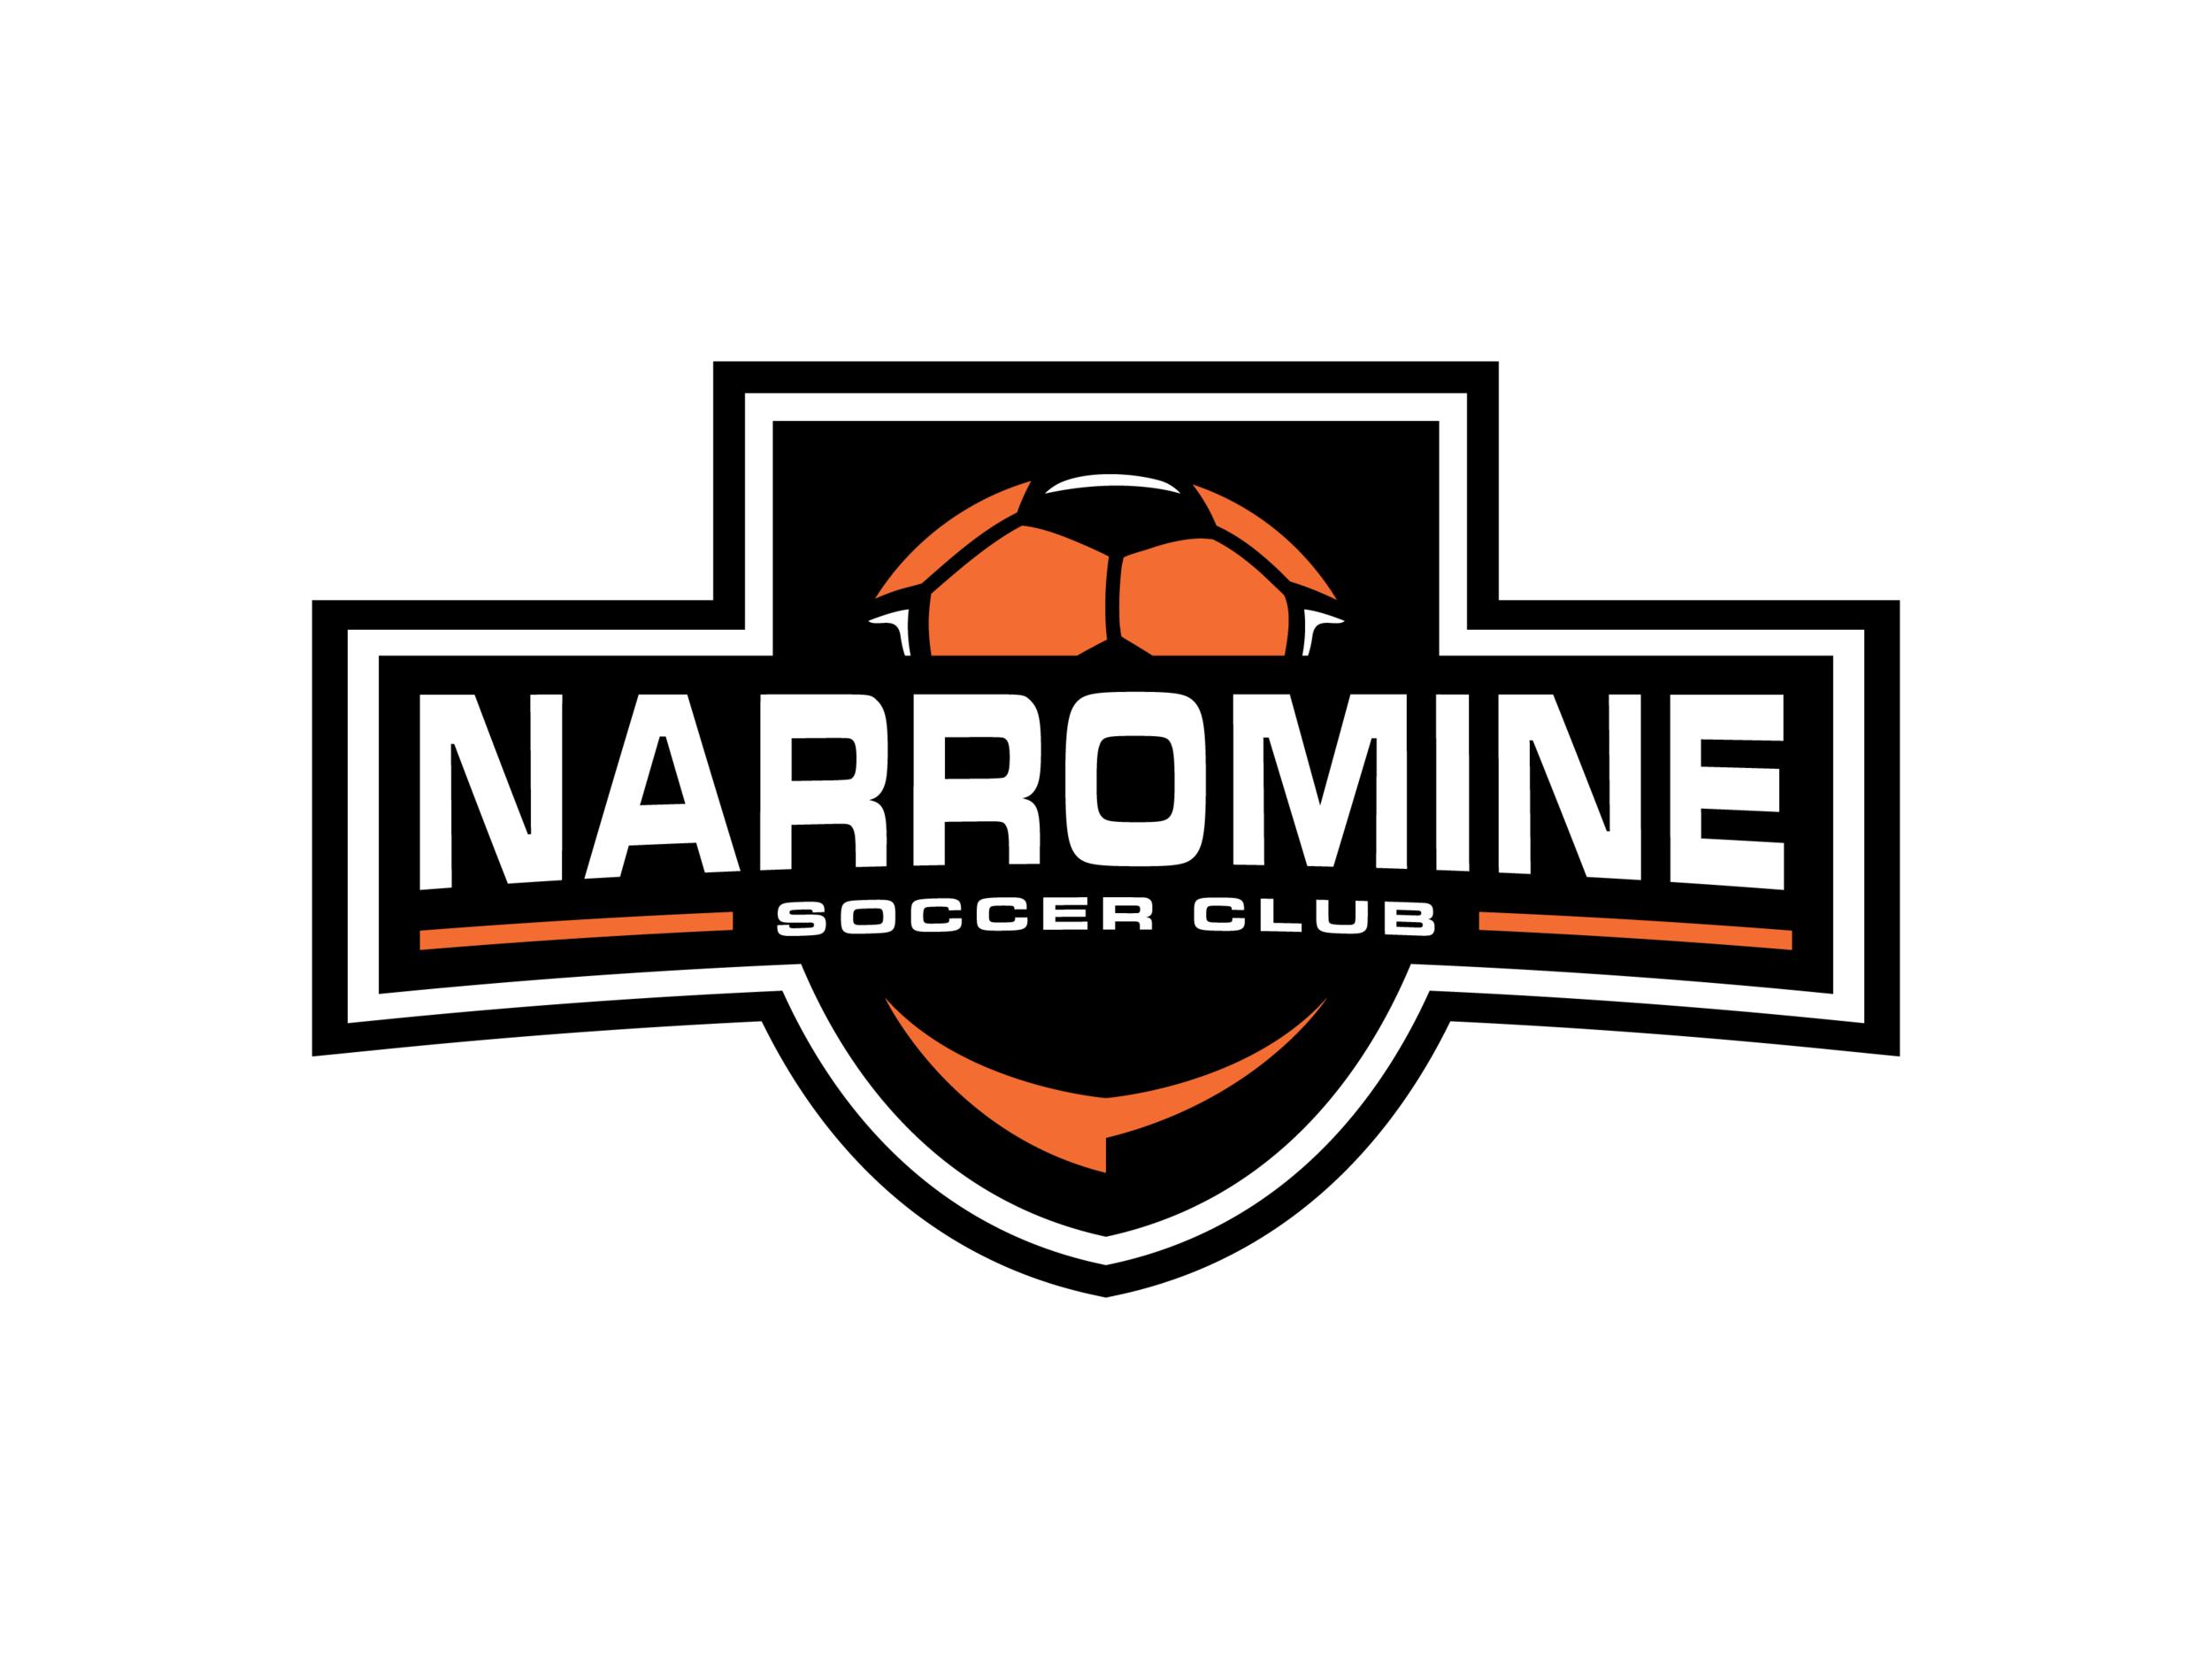 Narromine Soccer Club